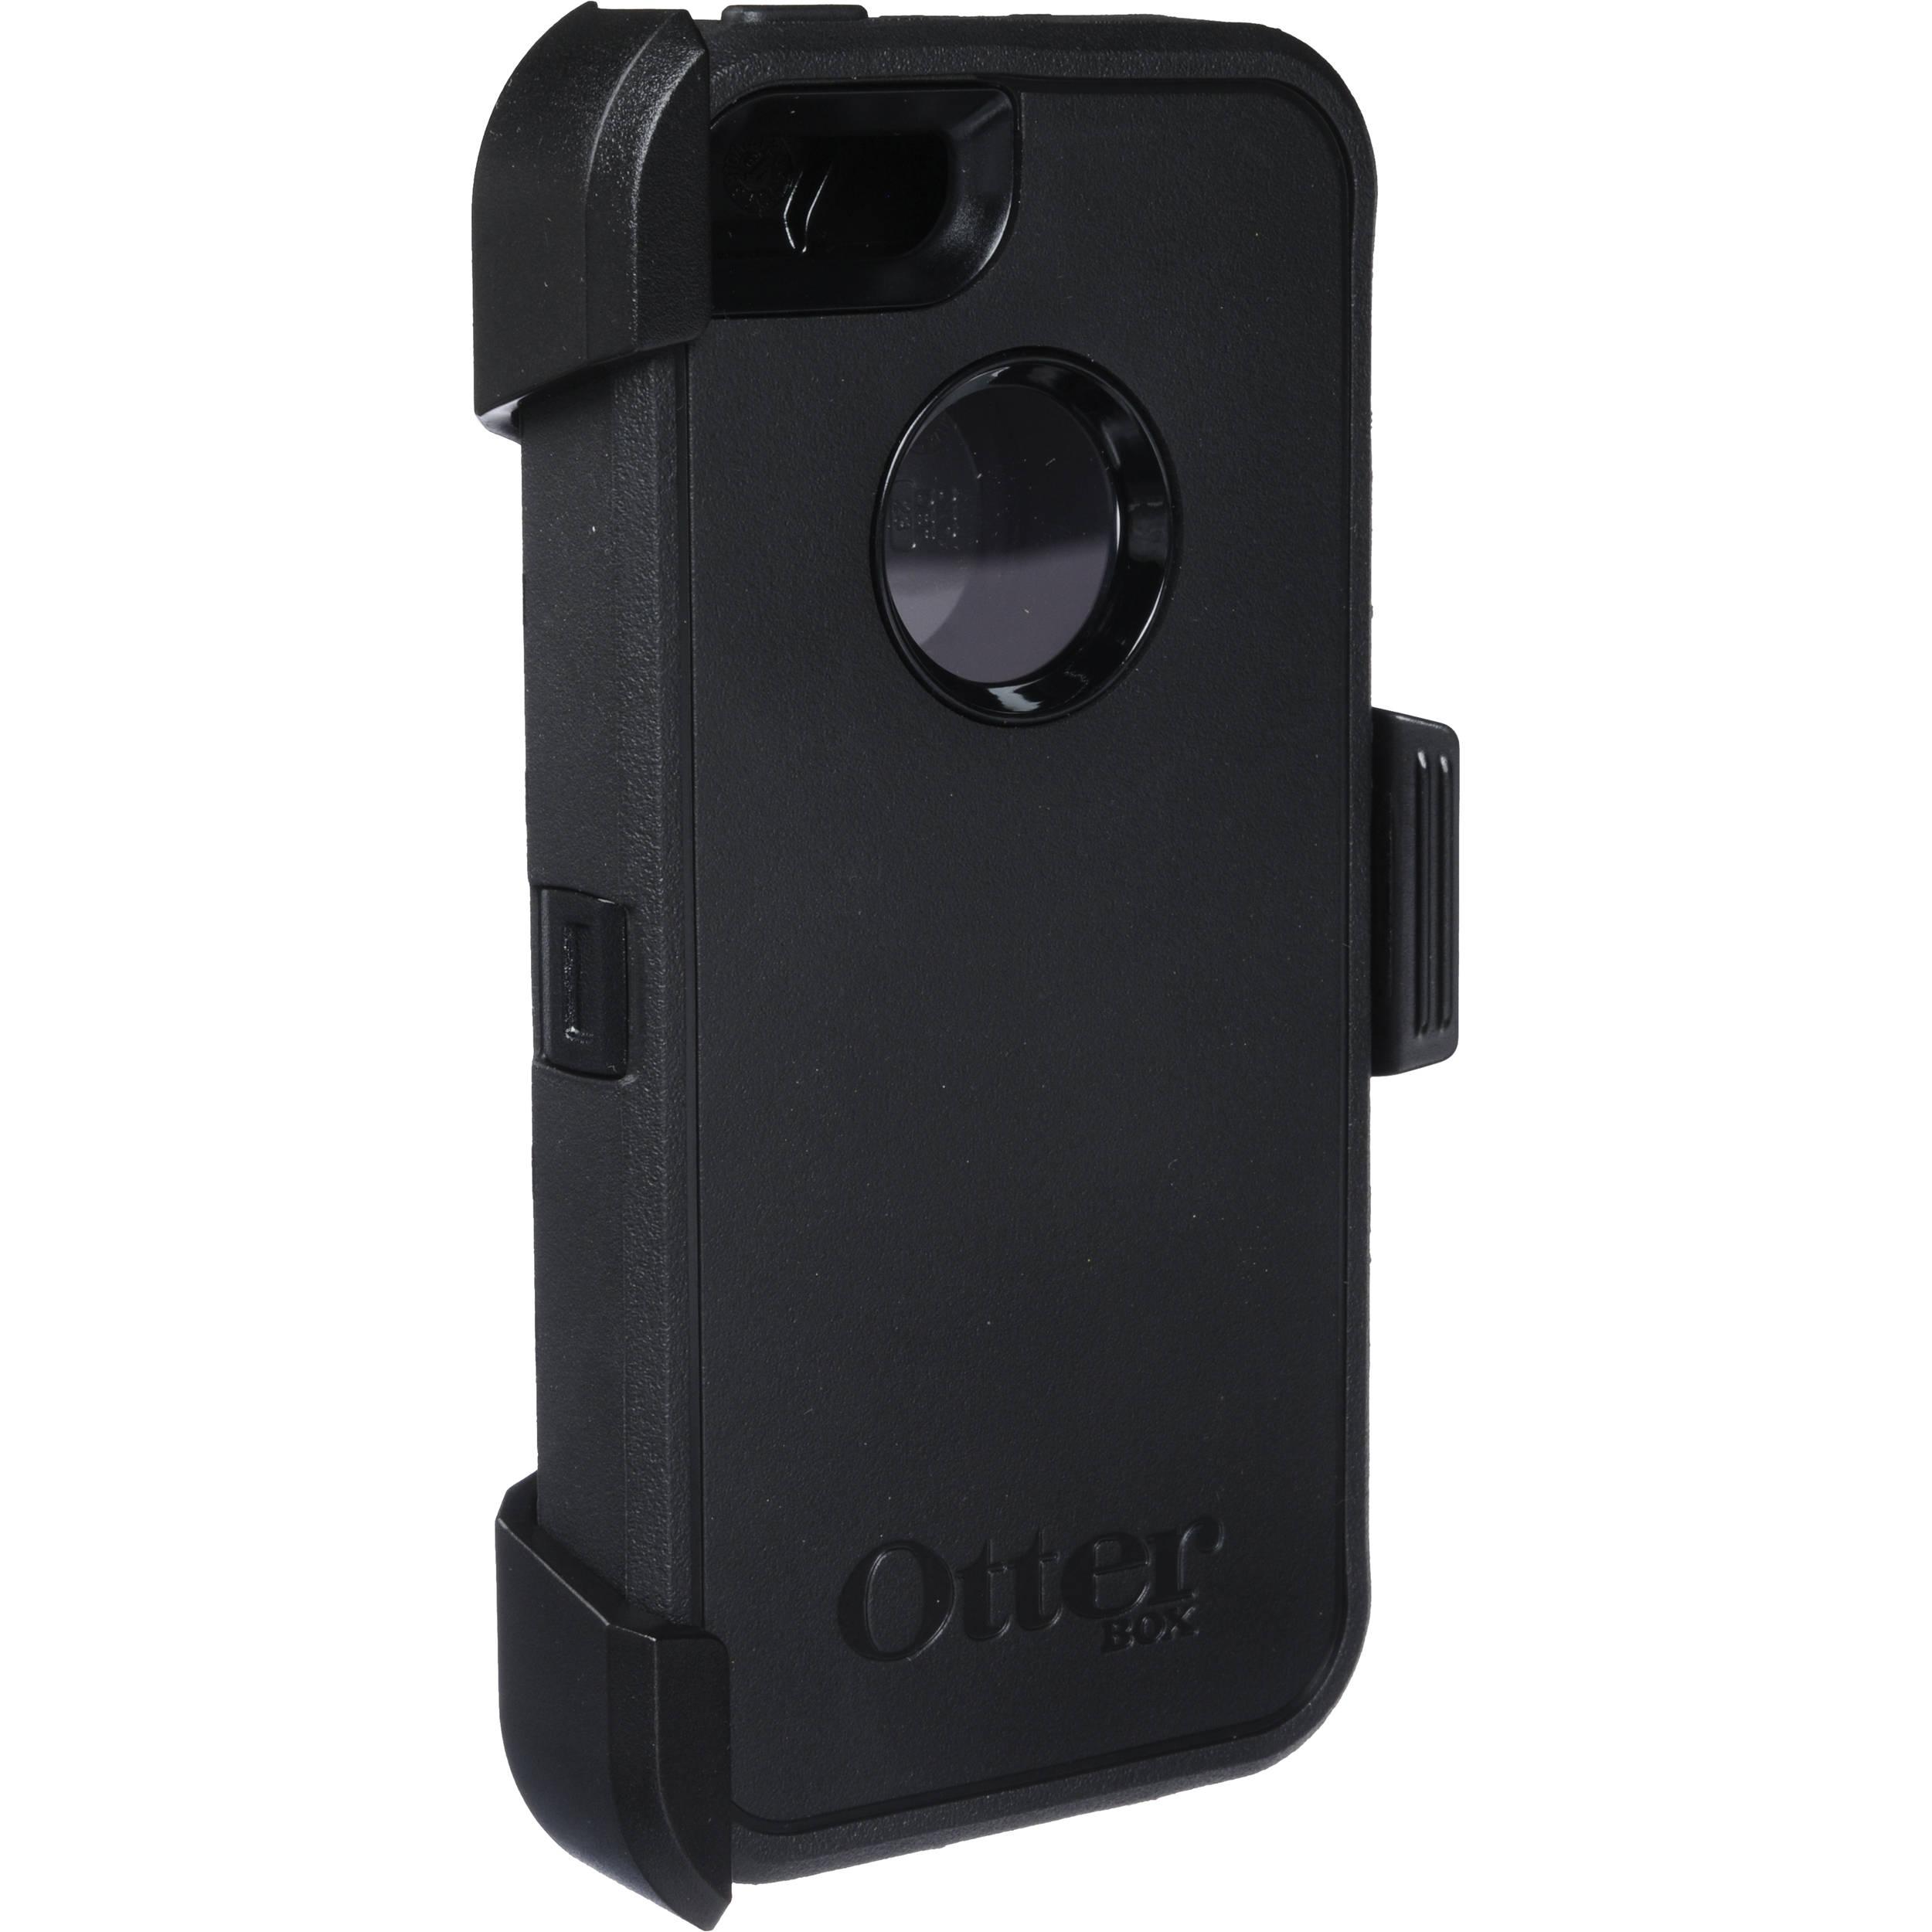 Otter Box Defender Case for iPhone 5/5s/SE (Black) 77-33322 Bu0026H